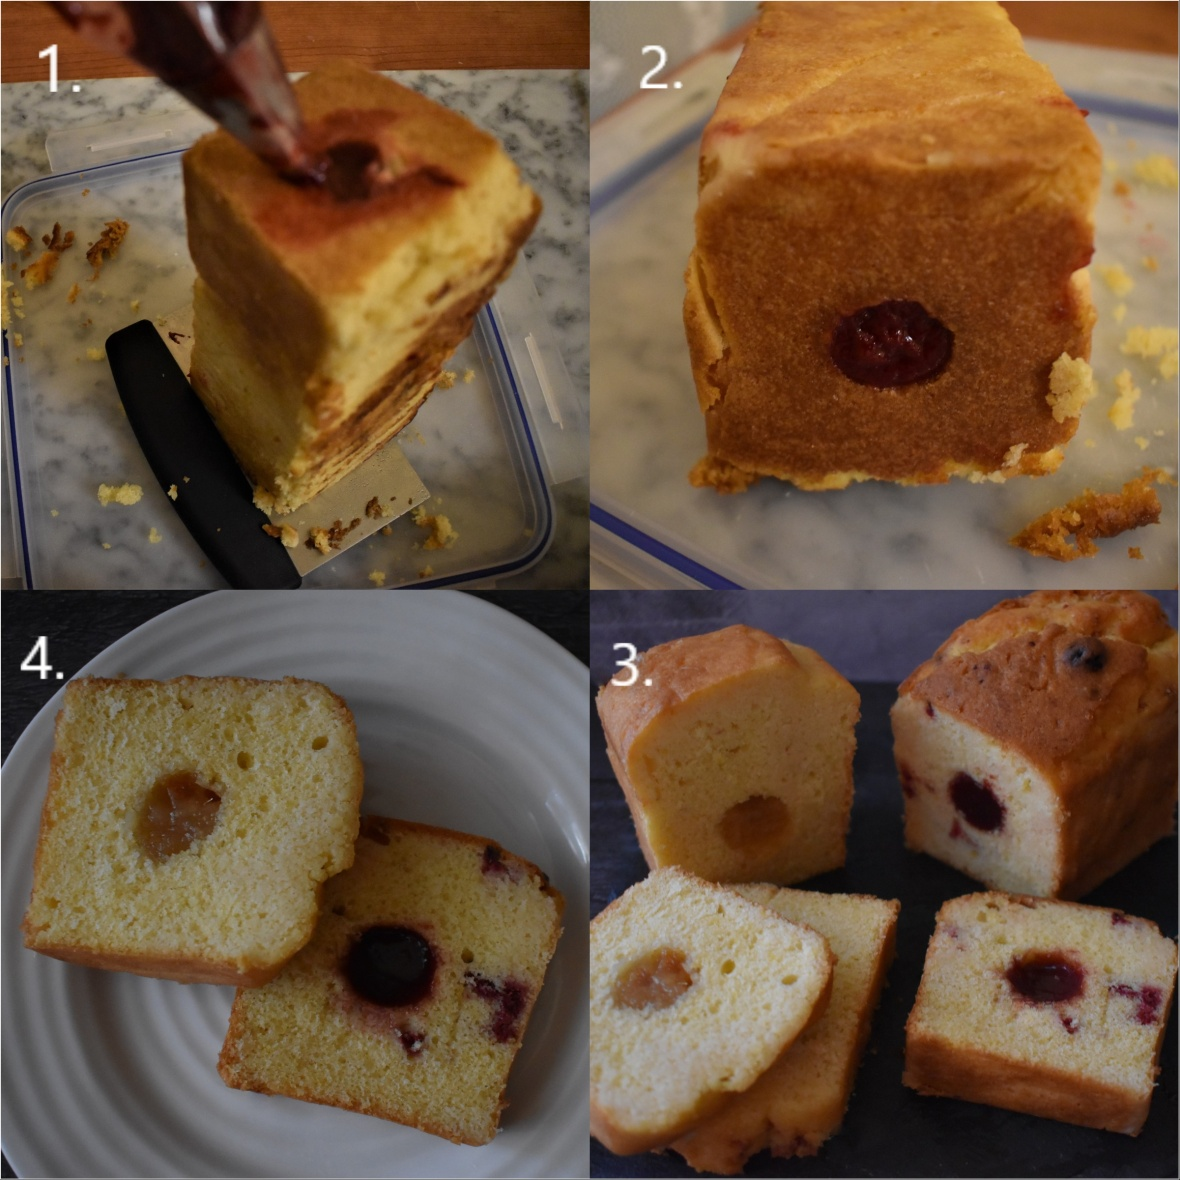 Lemon and raspberry insert in rocher loaf cake